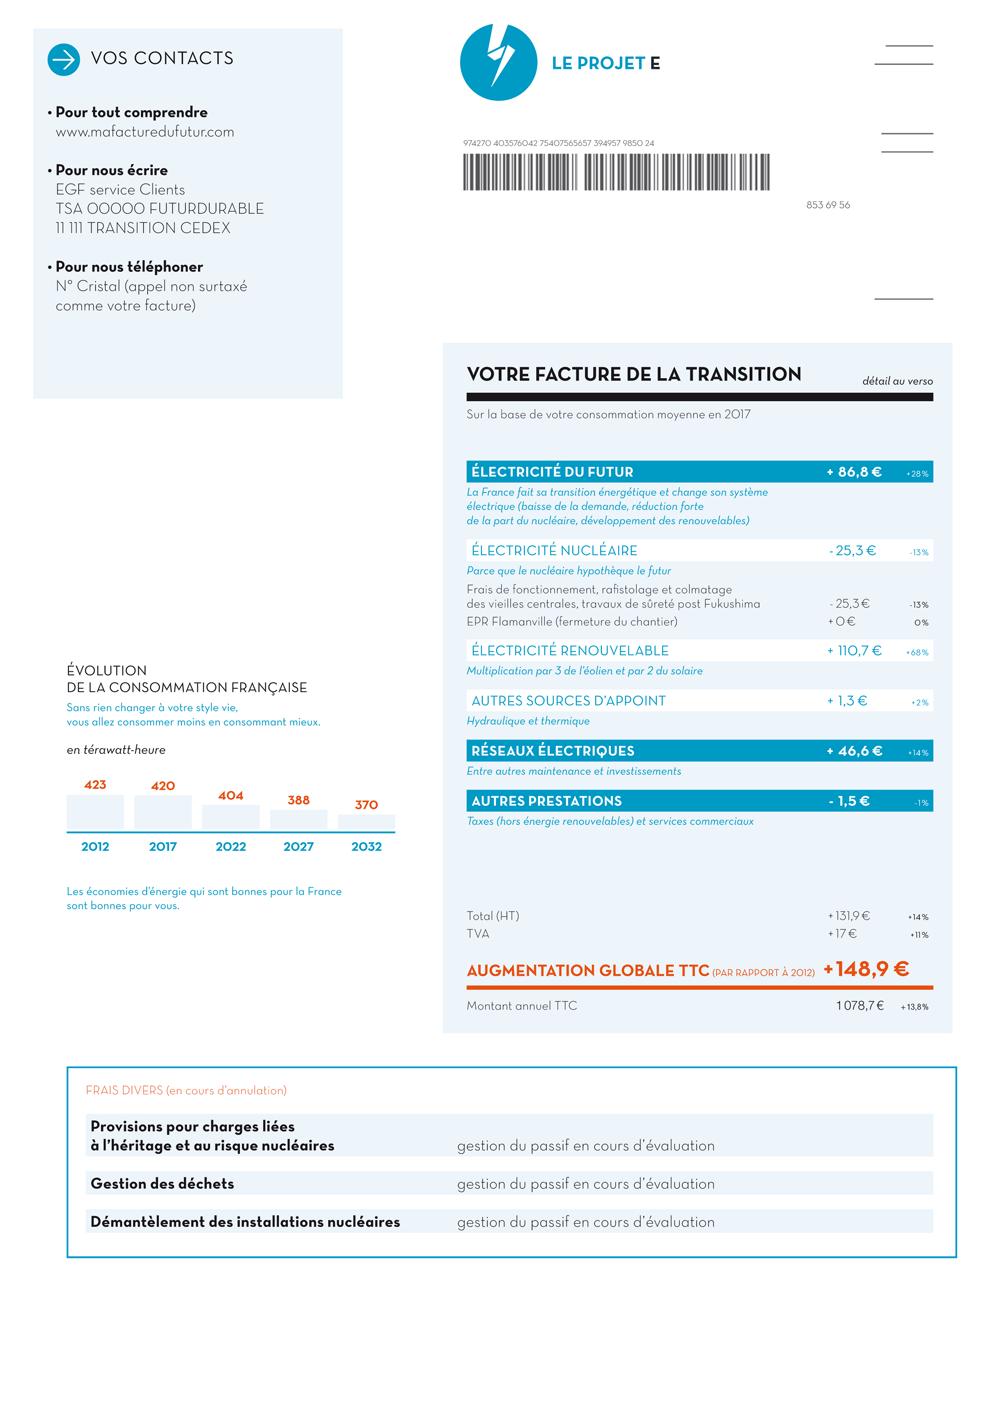 Ma facture du futur greenpeace - Edf fr rubrique facture ...